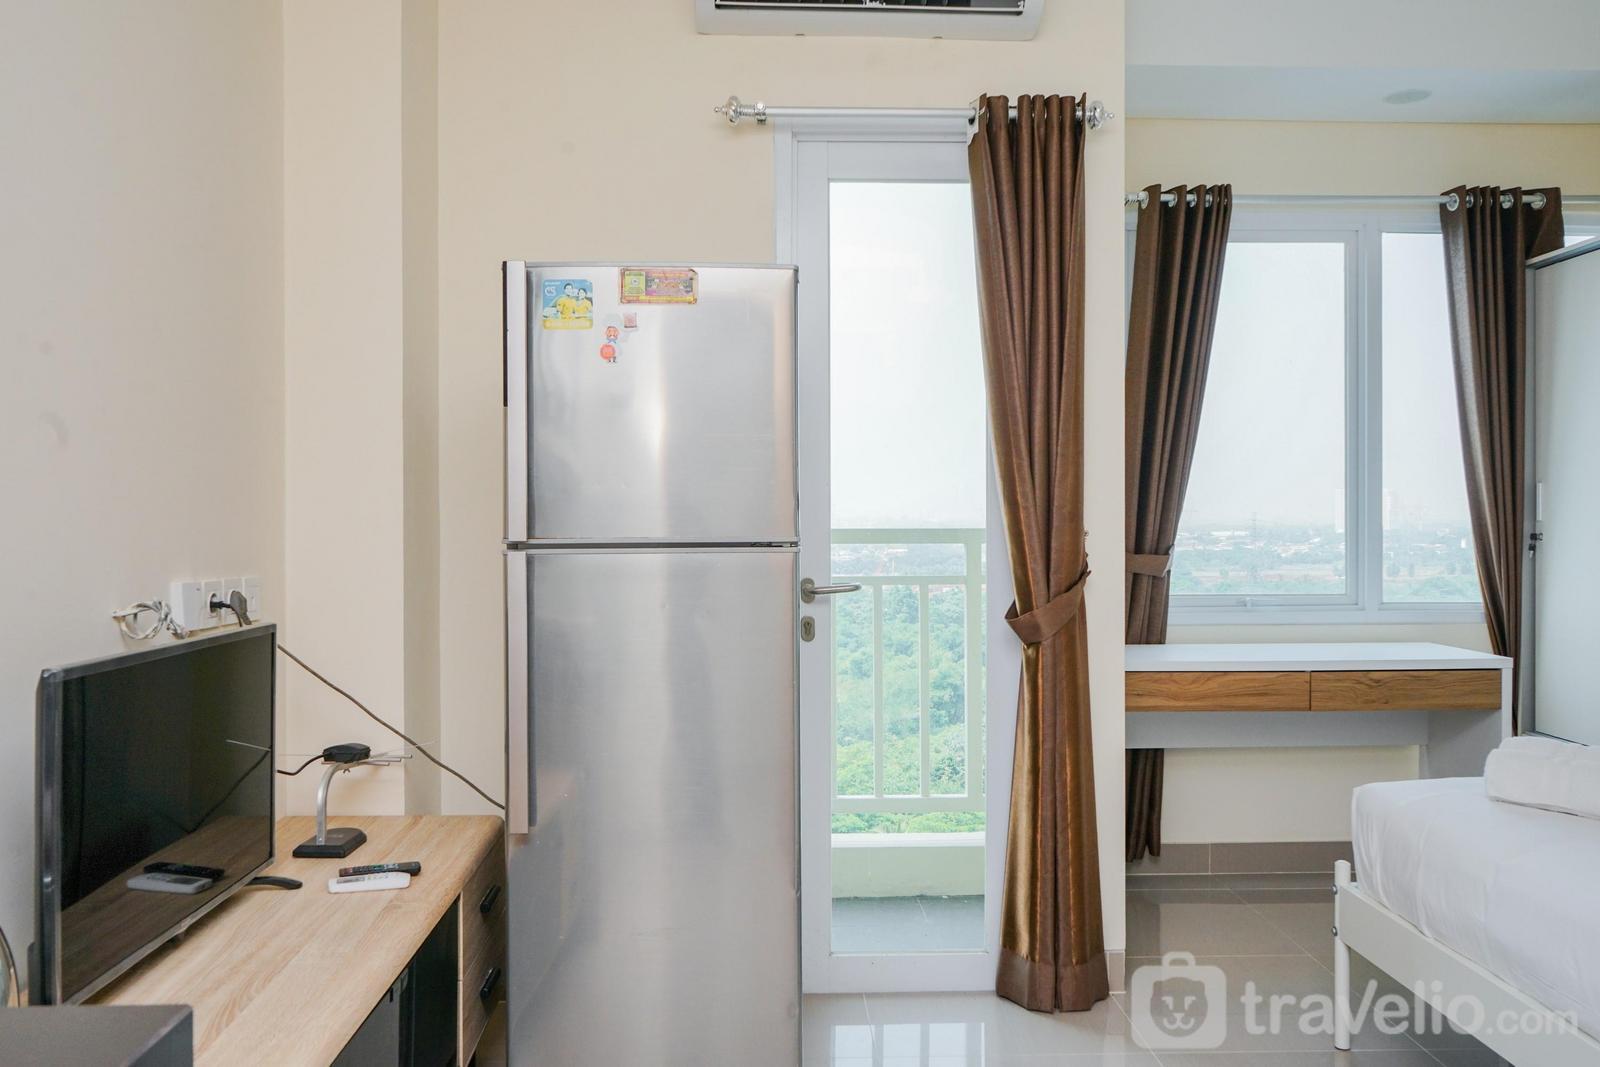 Apartemen B Residence - Minimalist Studio Apartment at B Residence near Aeon Mall BSD By Travelio